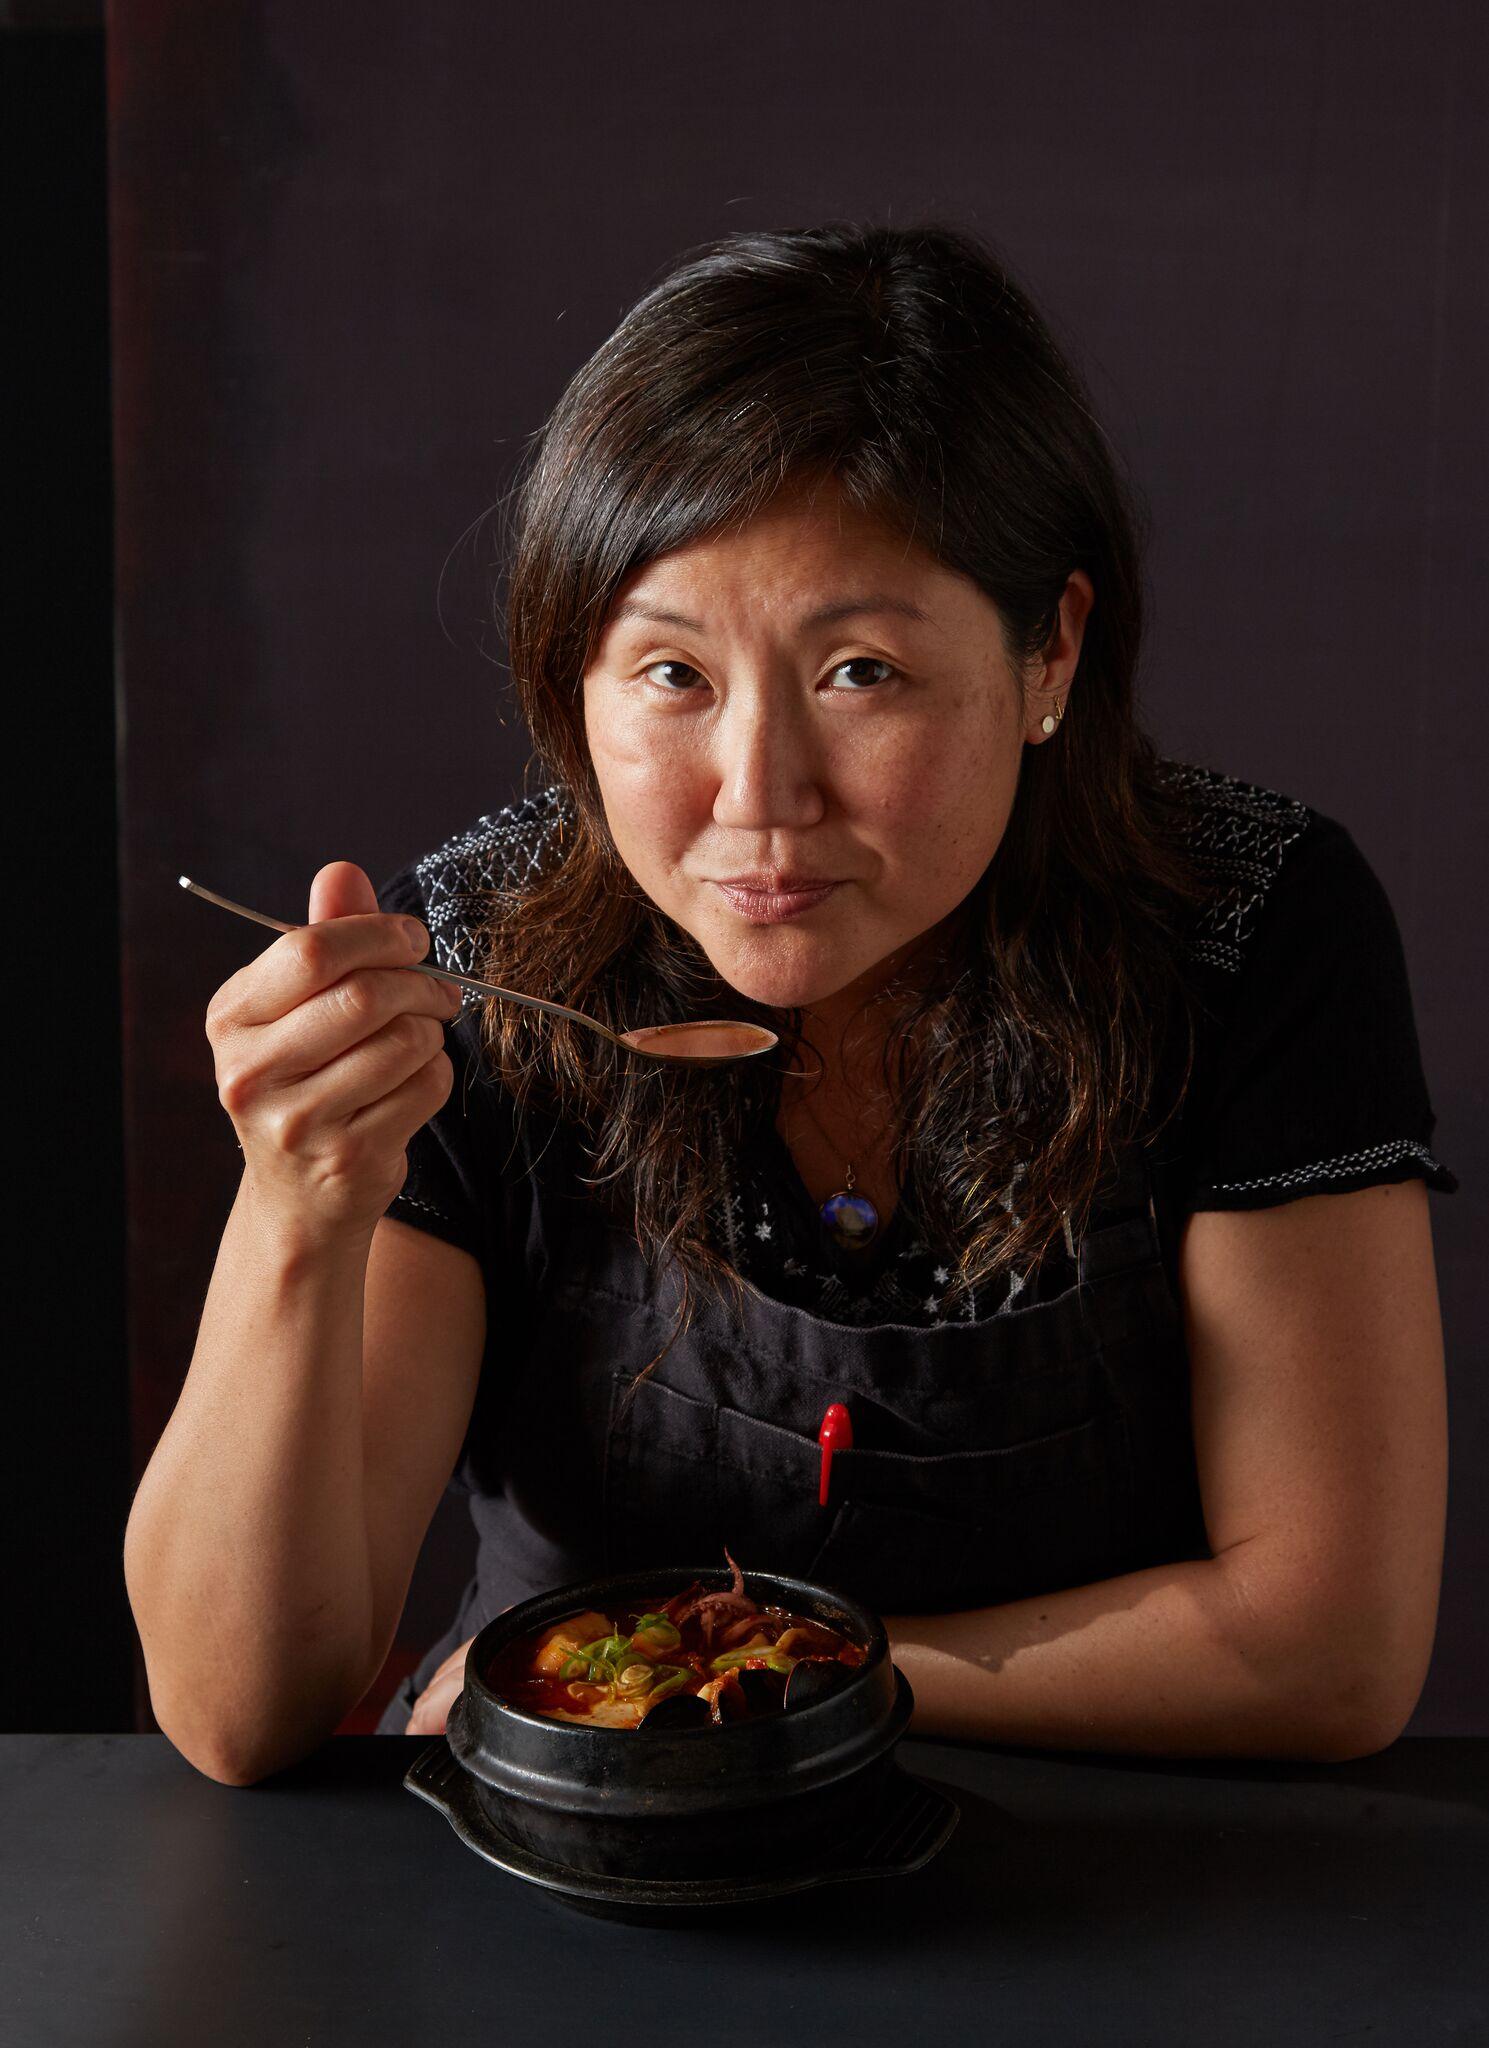 Sohui Kim - Restaurants; Where Community Comes Together